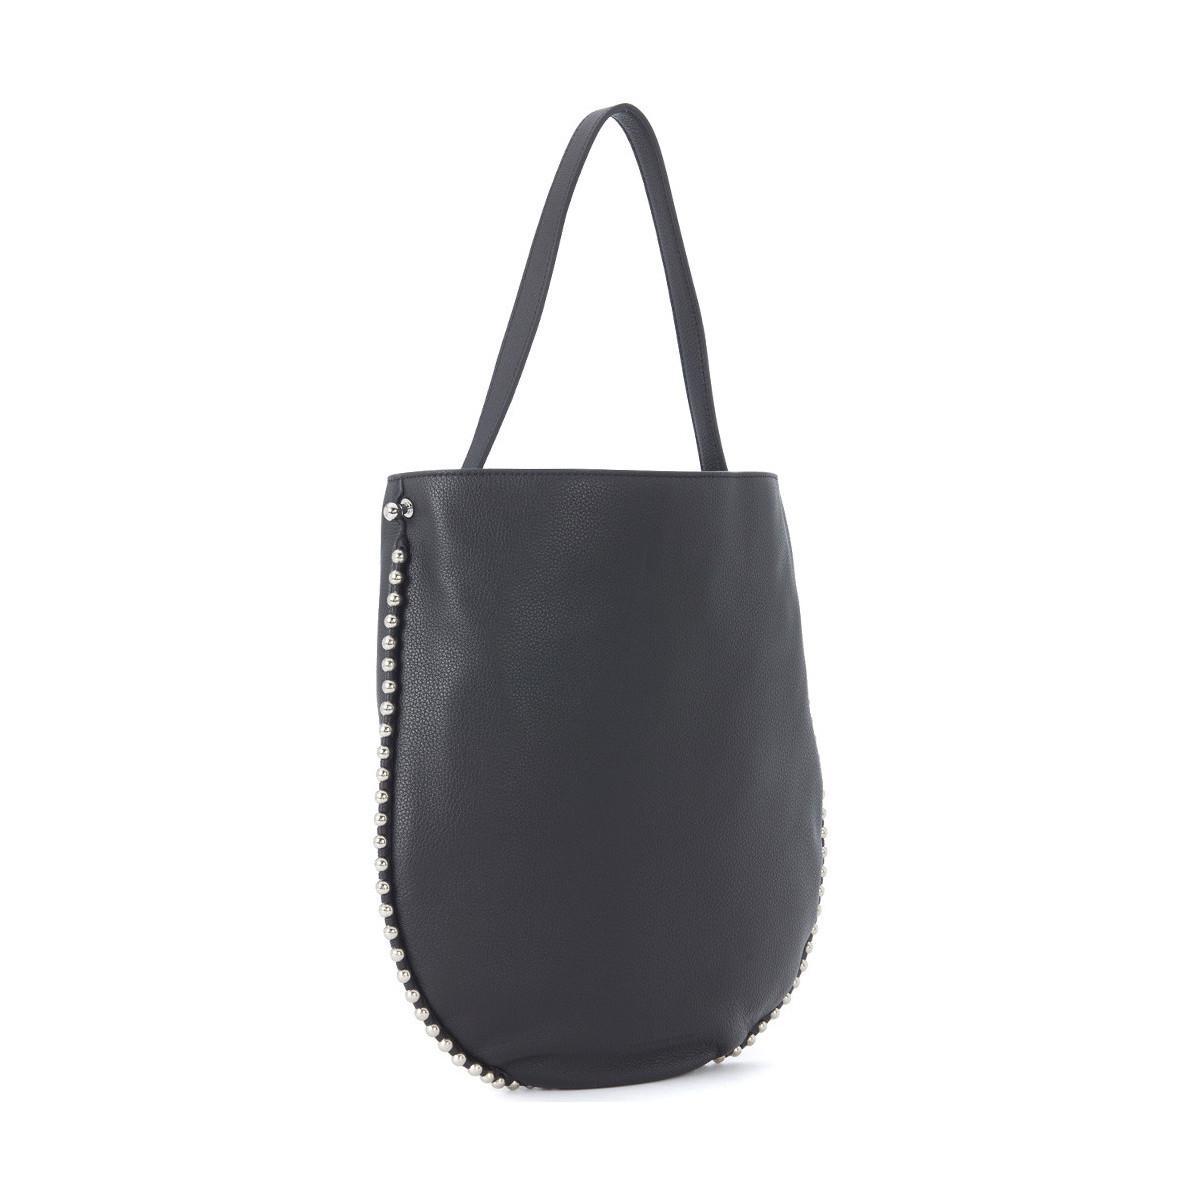 bc2fbf5bc2 Alexander Wang Roxy Hobo Black Leather Shoulder Bag Men s In Black ...